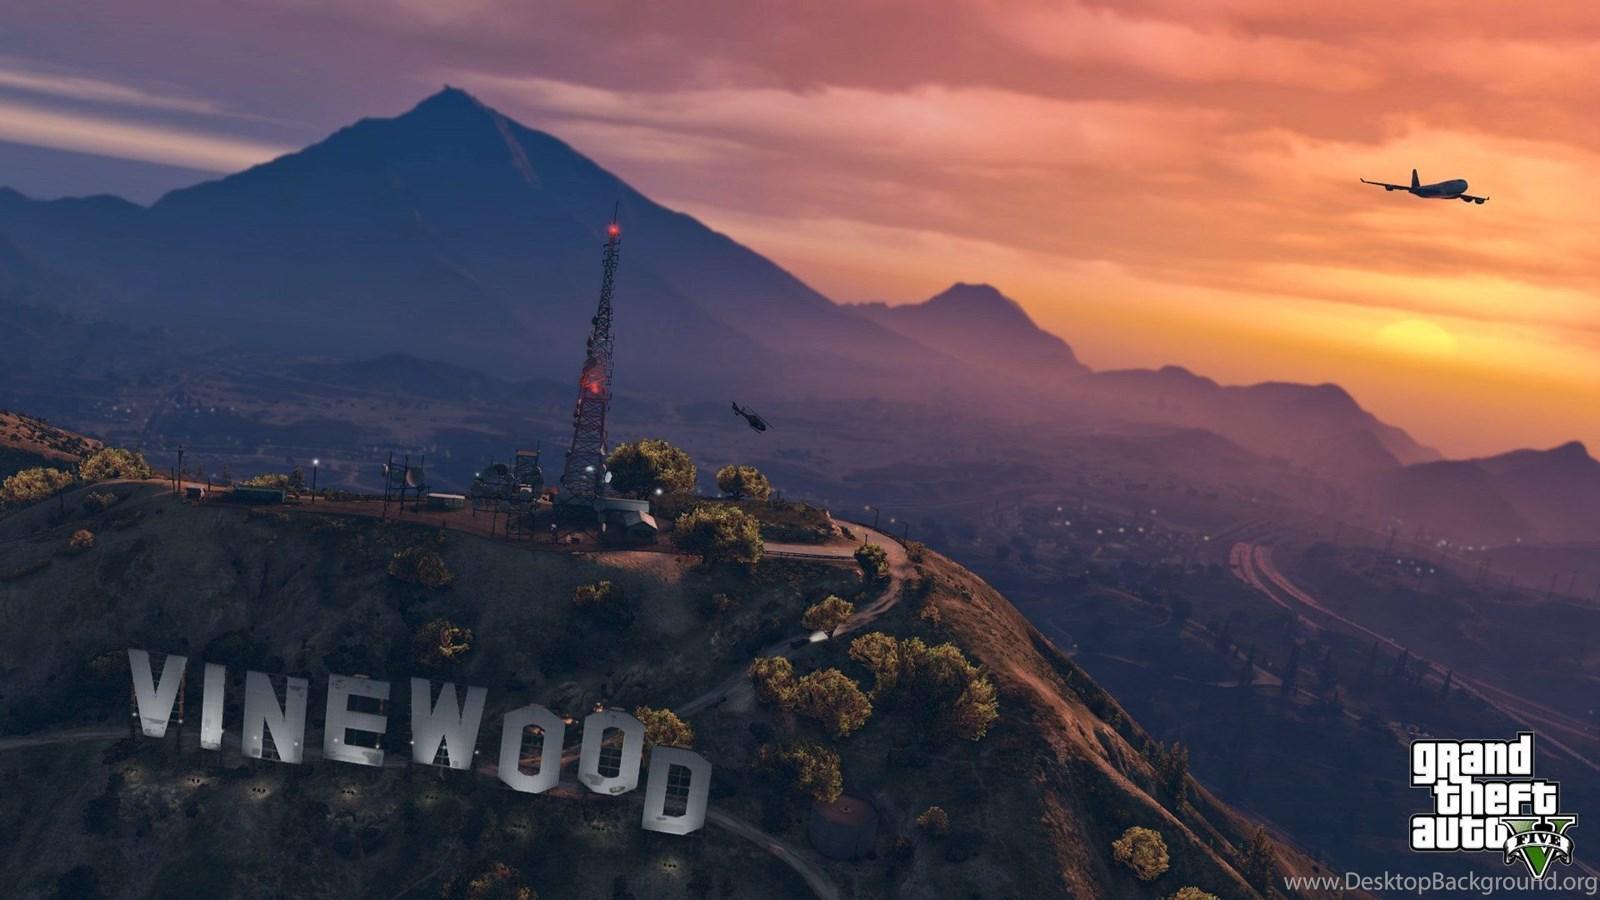 GTA 5 Grand Theft Auto Wallpapers HD Desktop Background